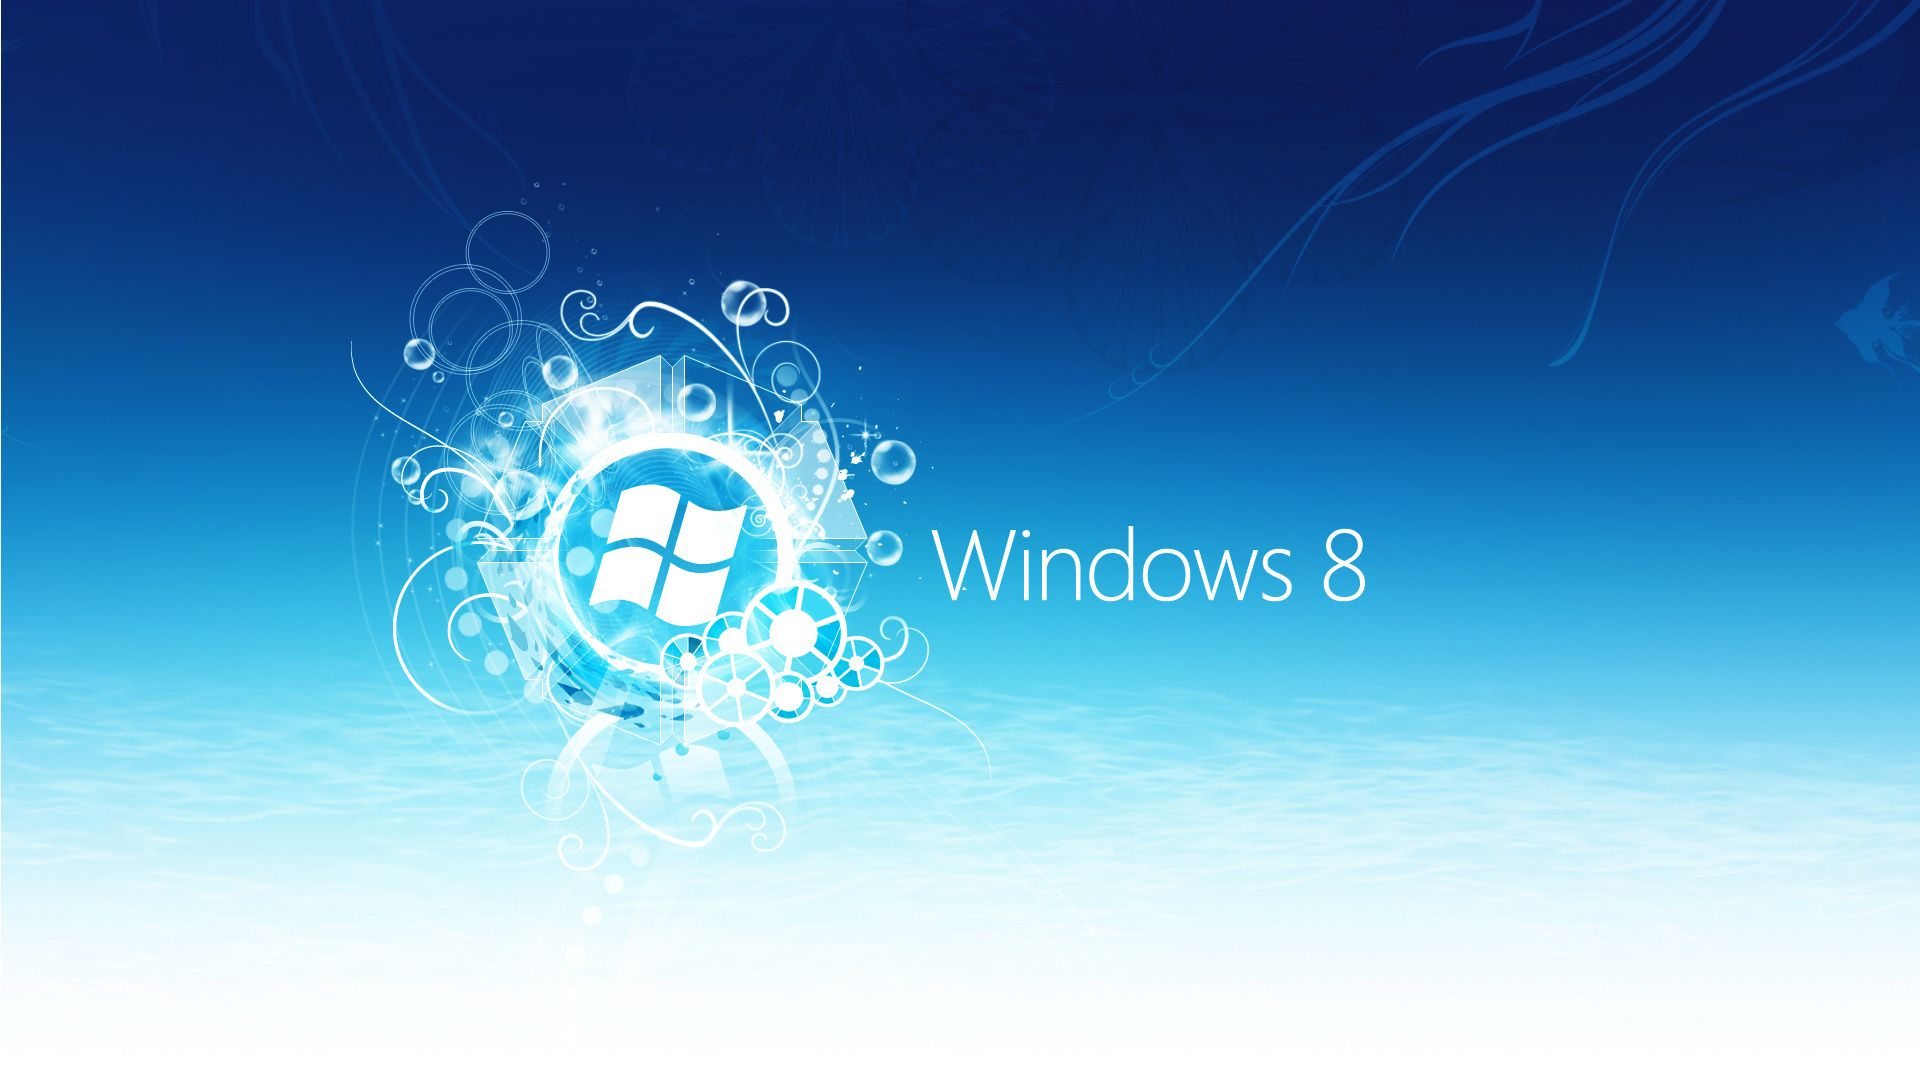 Windows 8 Desktop Background Windows Wallpaper Hd Wallpapers 1080p Live Wallpapers